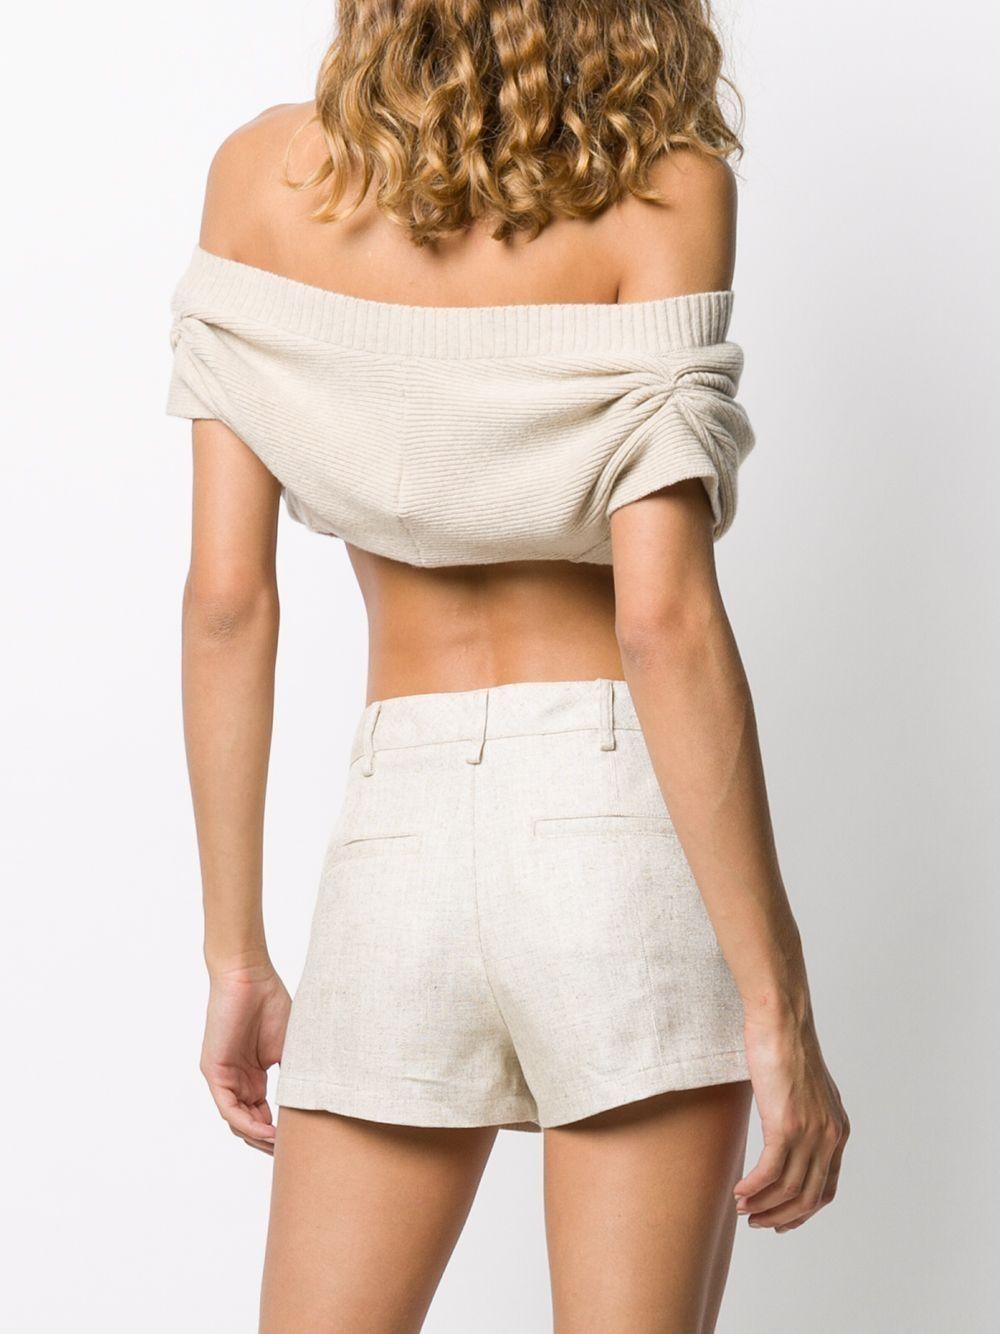 Cardigan giromanica corto Valerie in lana beige con spalle scoperte JACQUEMUS | Cardigan | 203KN39-208800